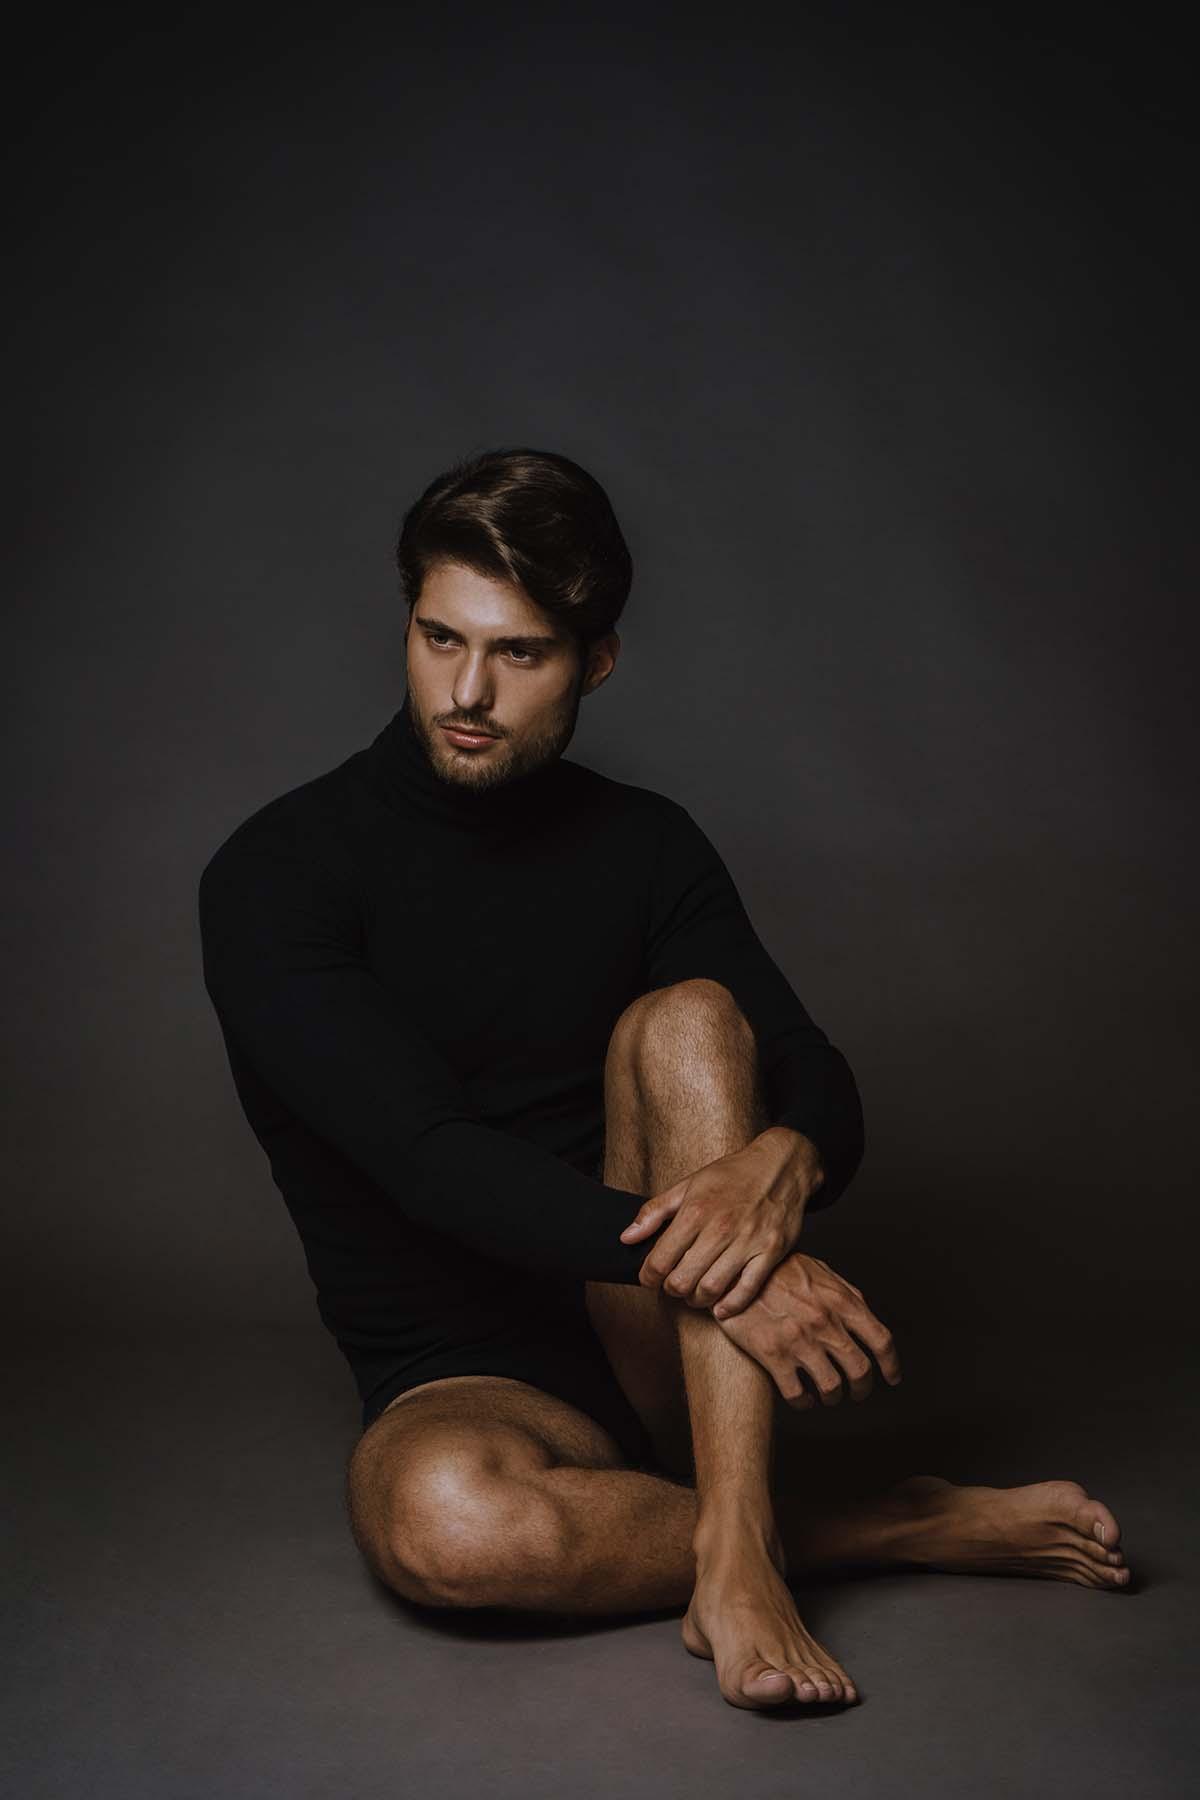 Vitor Bianchi by Fer Stein for Brazilian Male Model